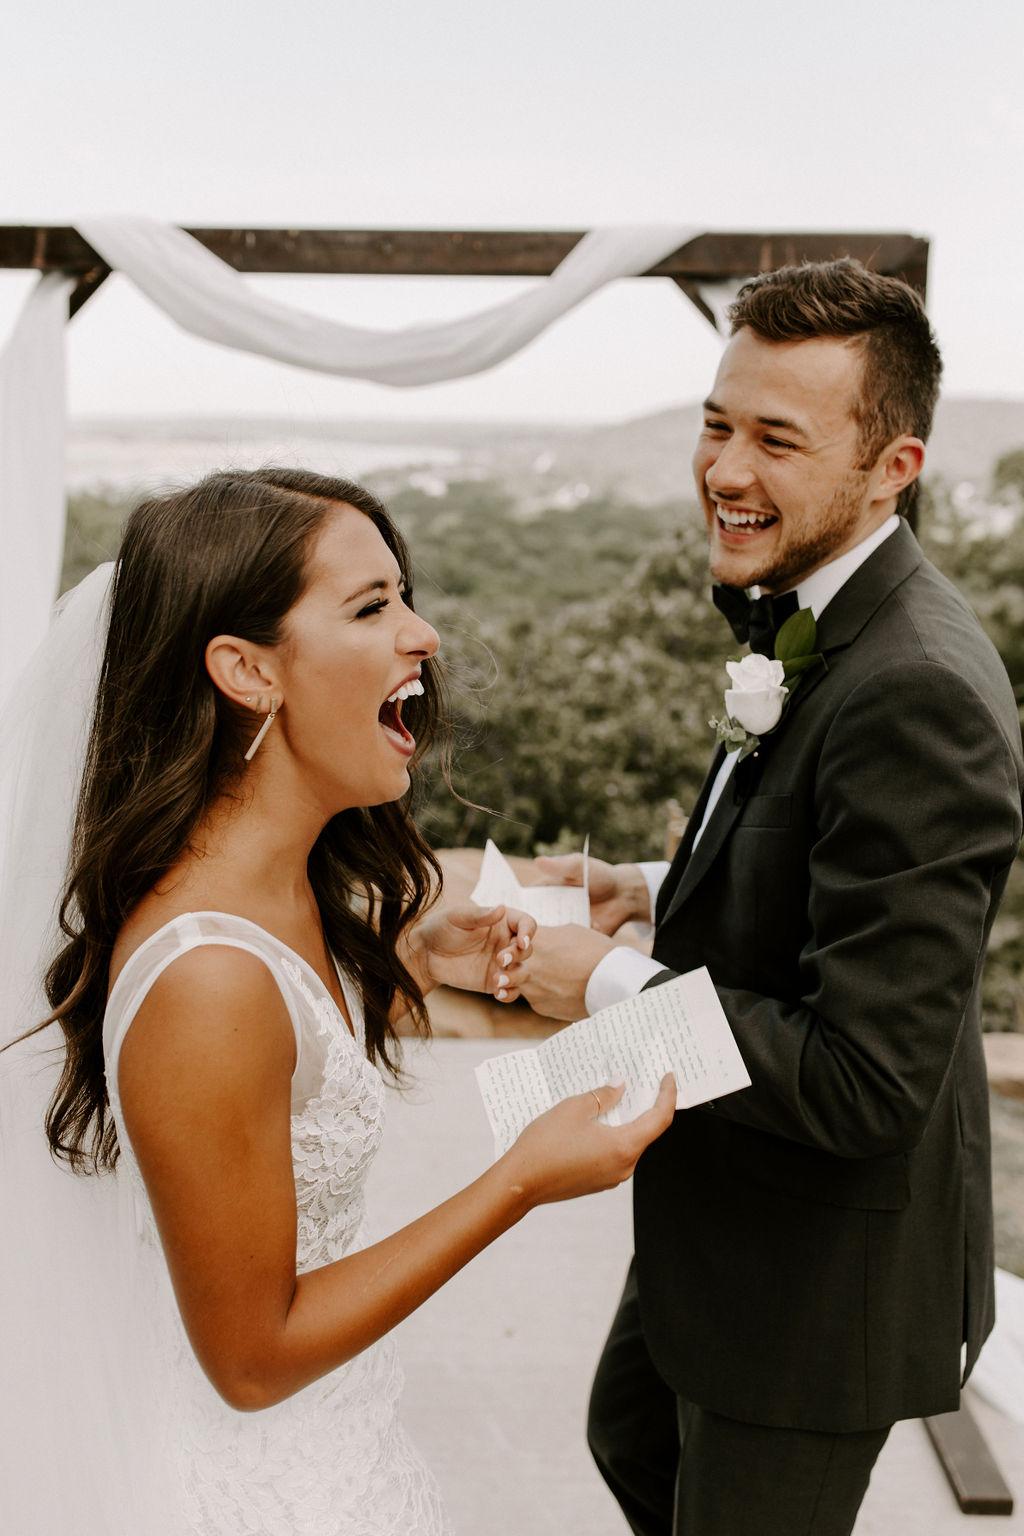 Tulsa White Barn Wedding Venue Outdoor Ceremony 43.jpg